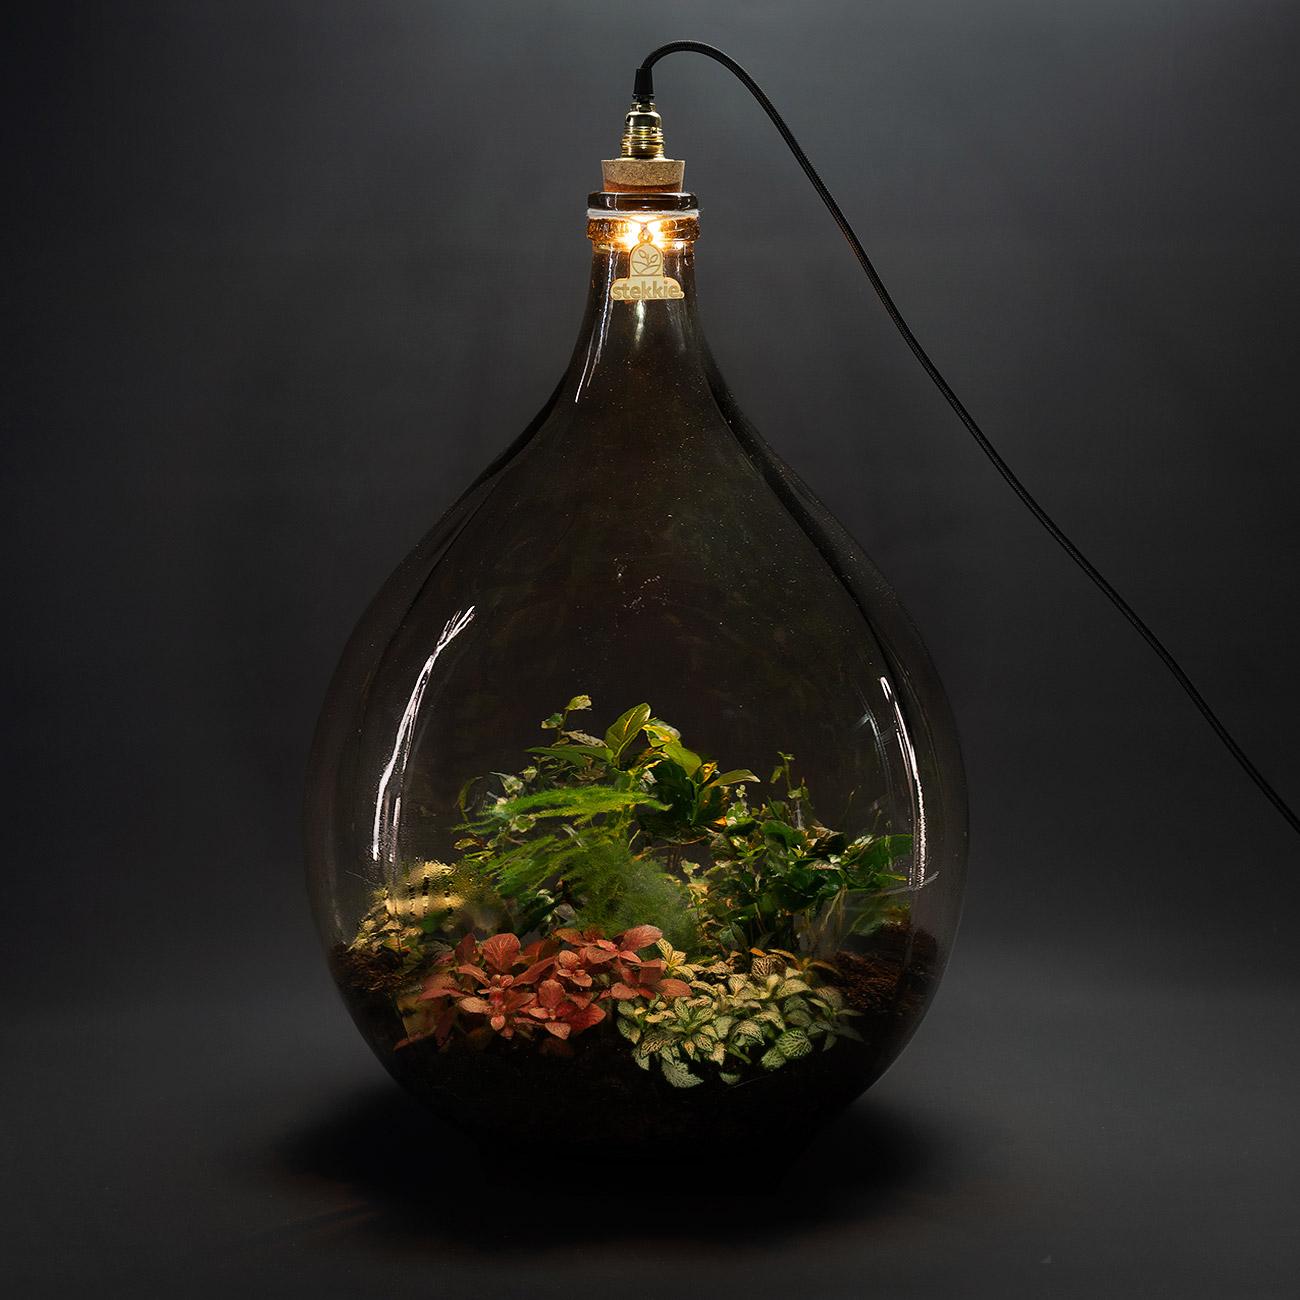 stekkie-extra-large-mini-ecosysteem-lamp-donker-1